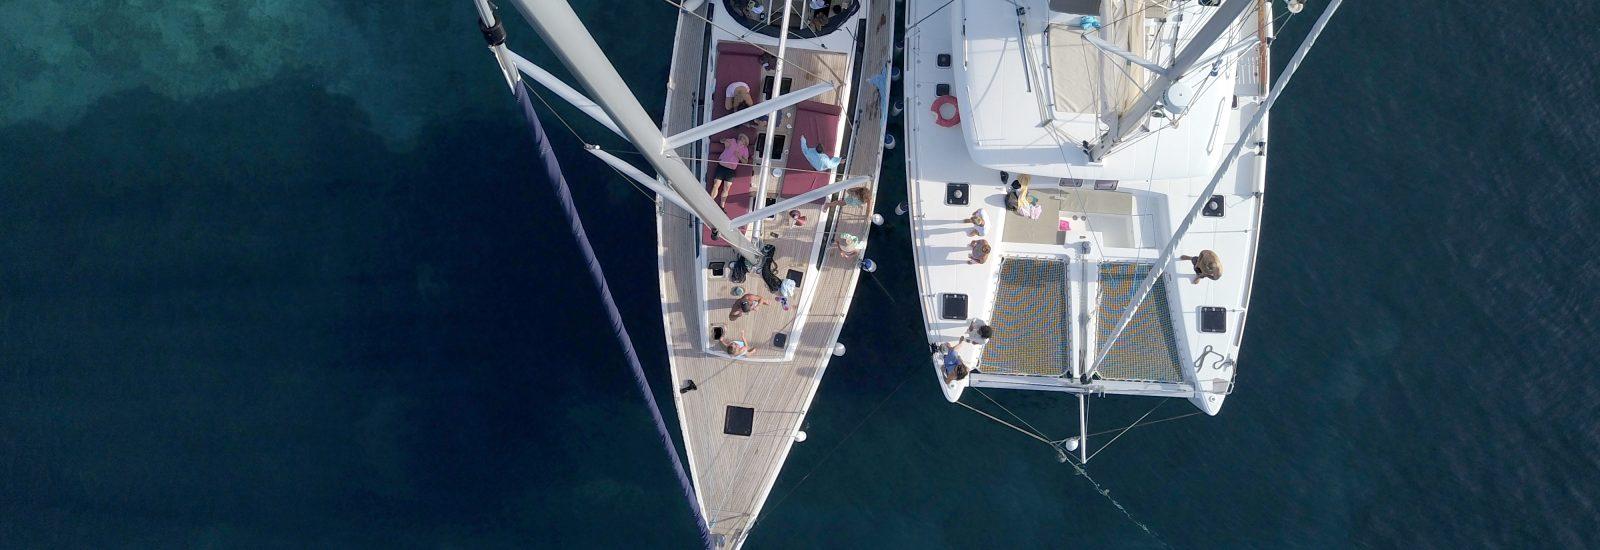 Sailing-yacht-boat-sea-banner